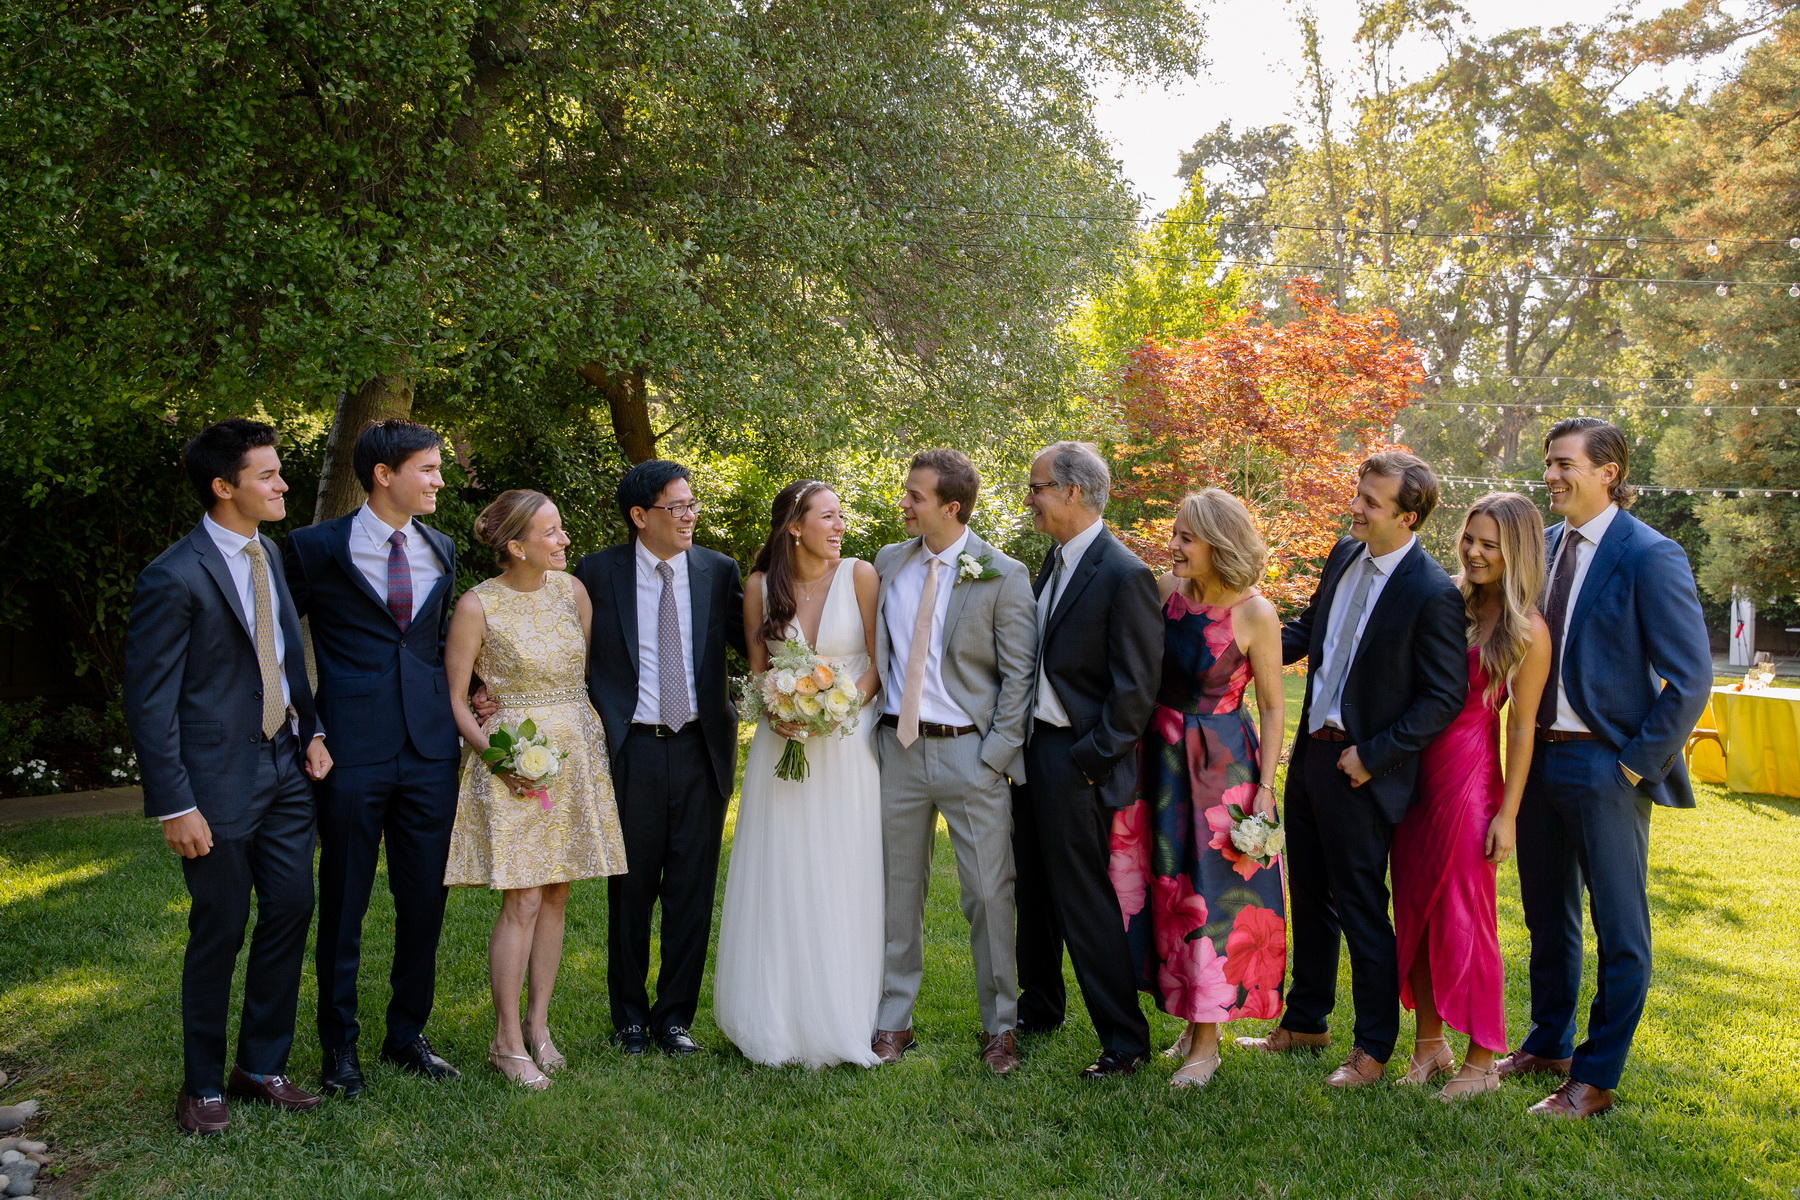 casual family wedding portait in their backyard